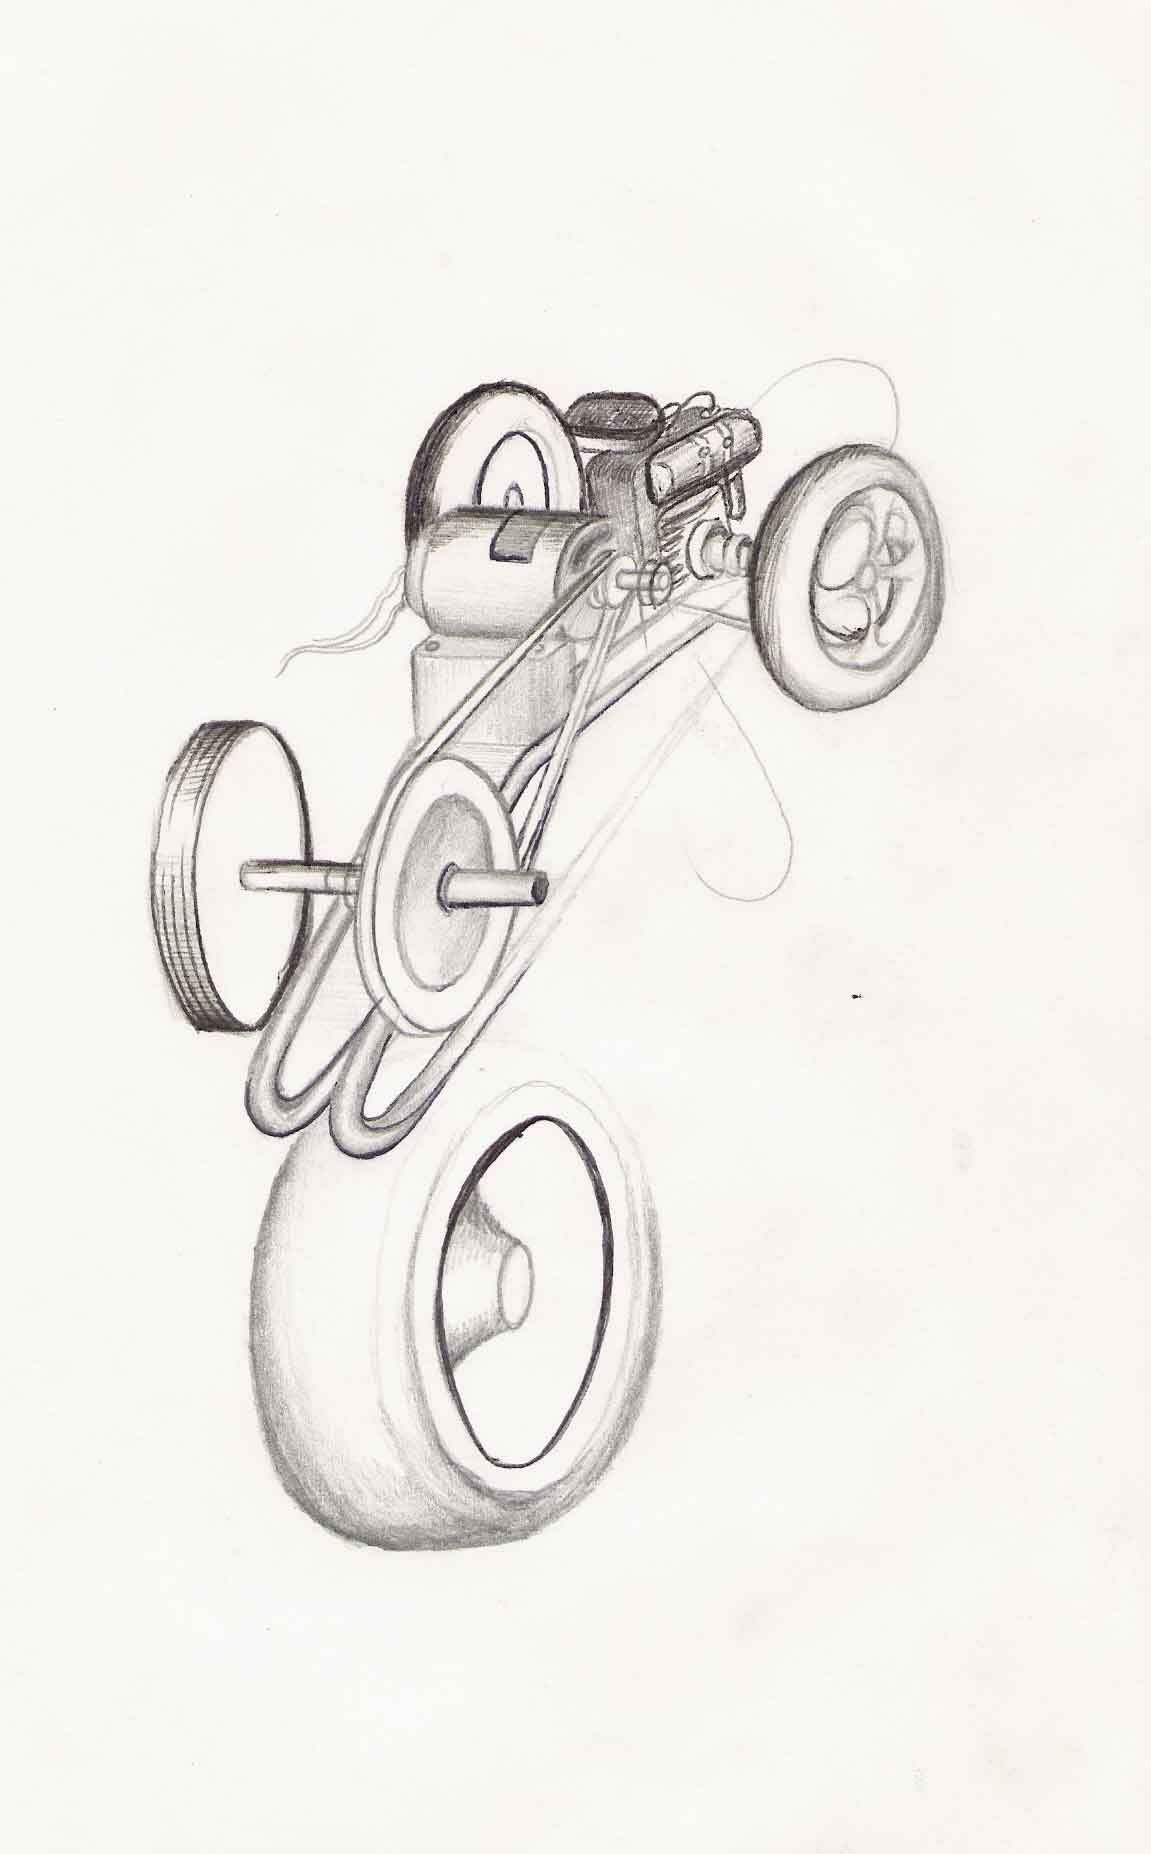 sketch-4-sept-05.jpg